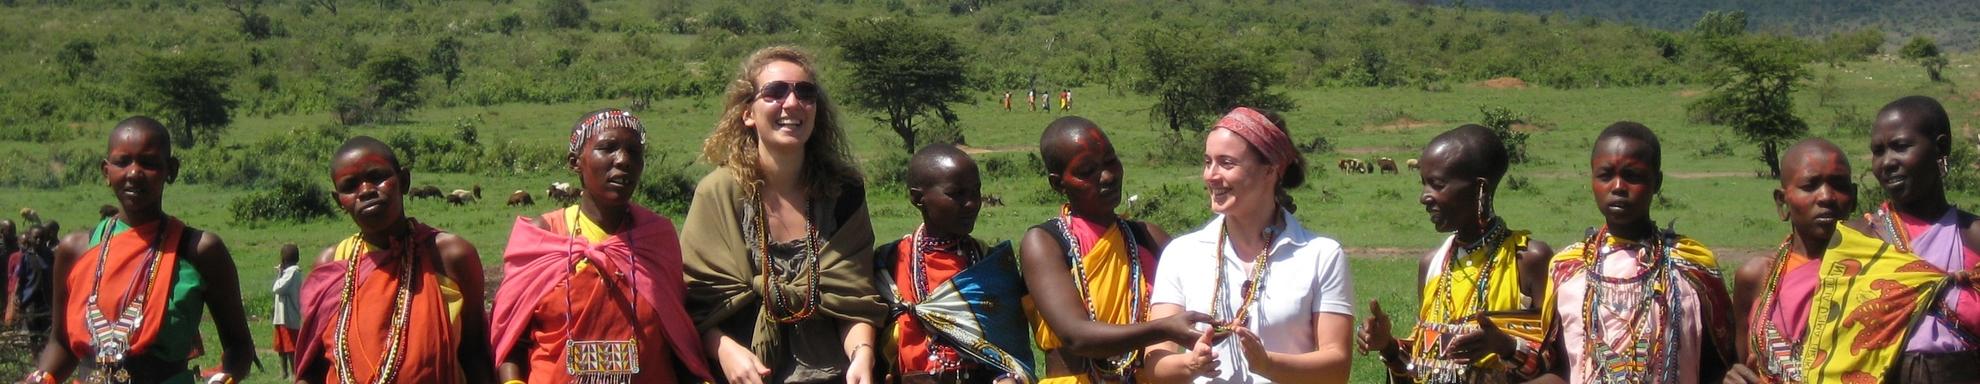 SASI tudy trip in Kenya